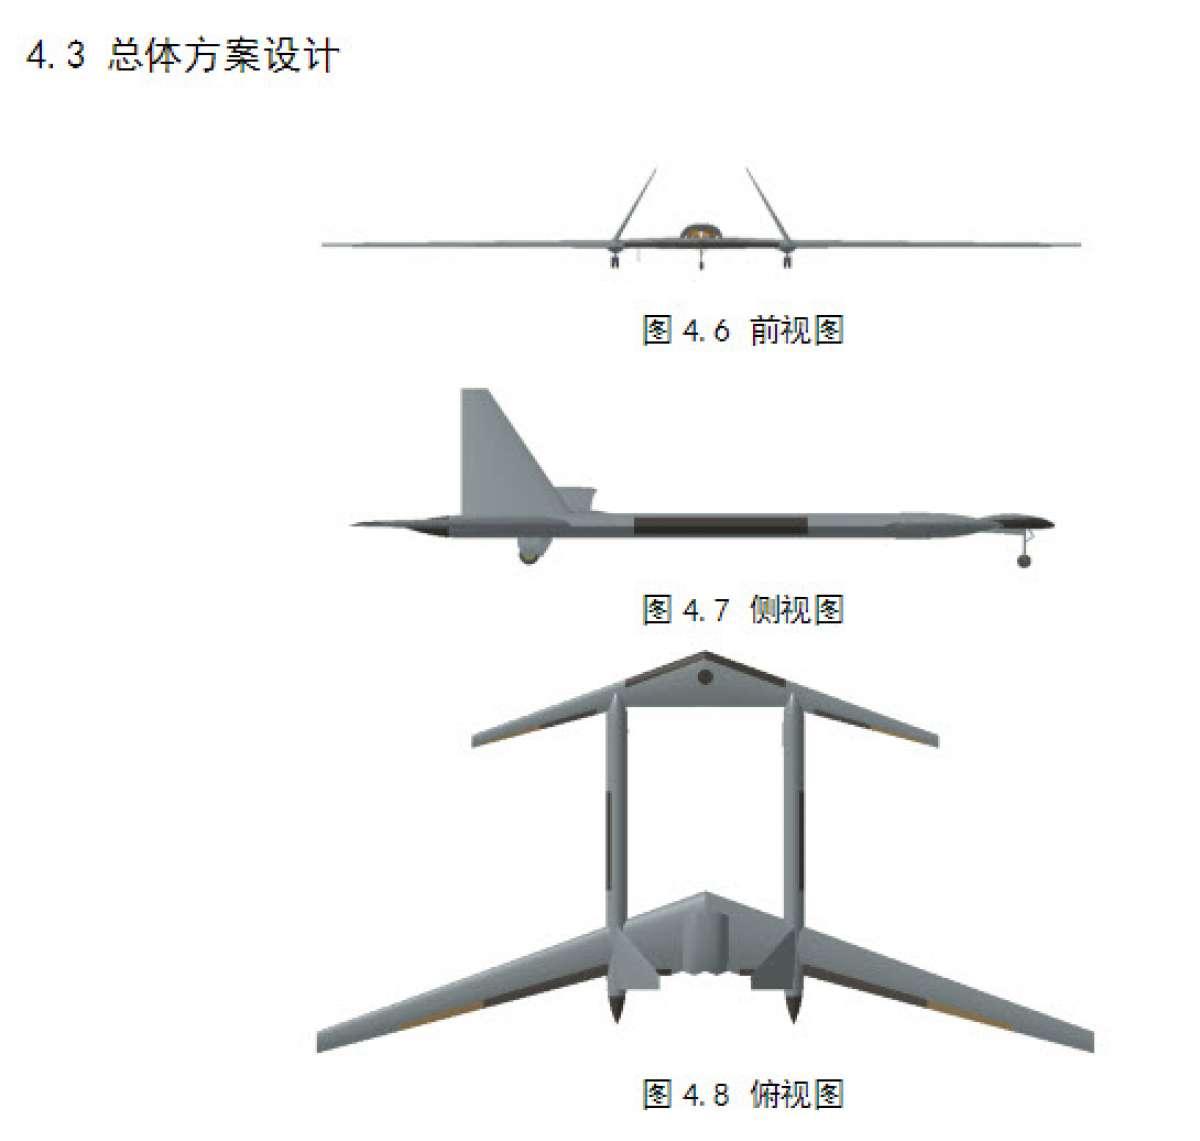 Acheter drone imaging hd drone